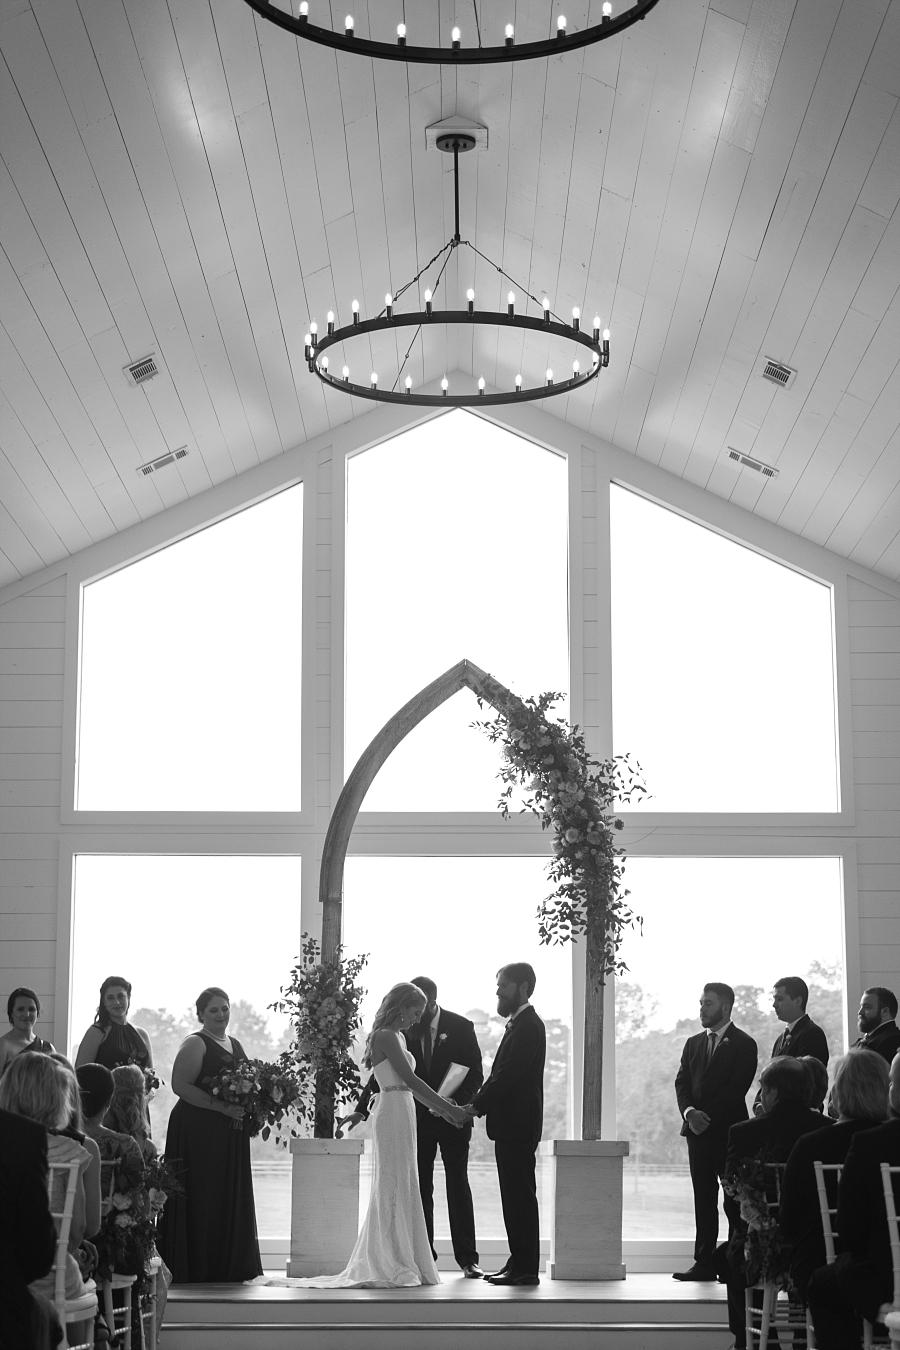 Stacy-Anderson-Photography-The-Farmhouse-Houston-Wedding-Photographer_0128.jpg